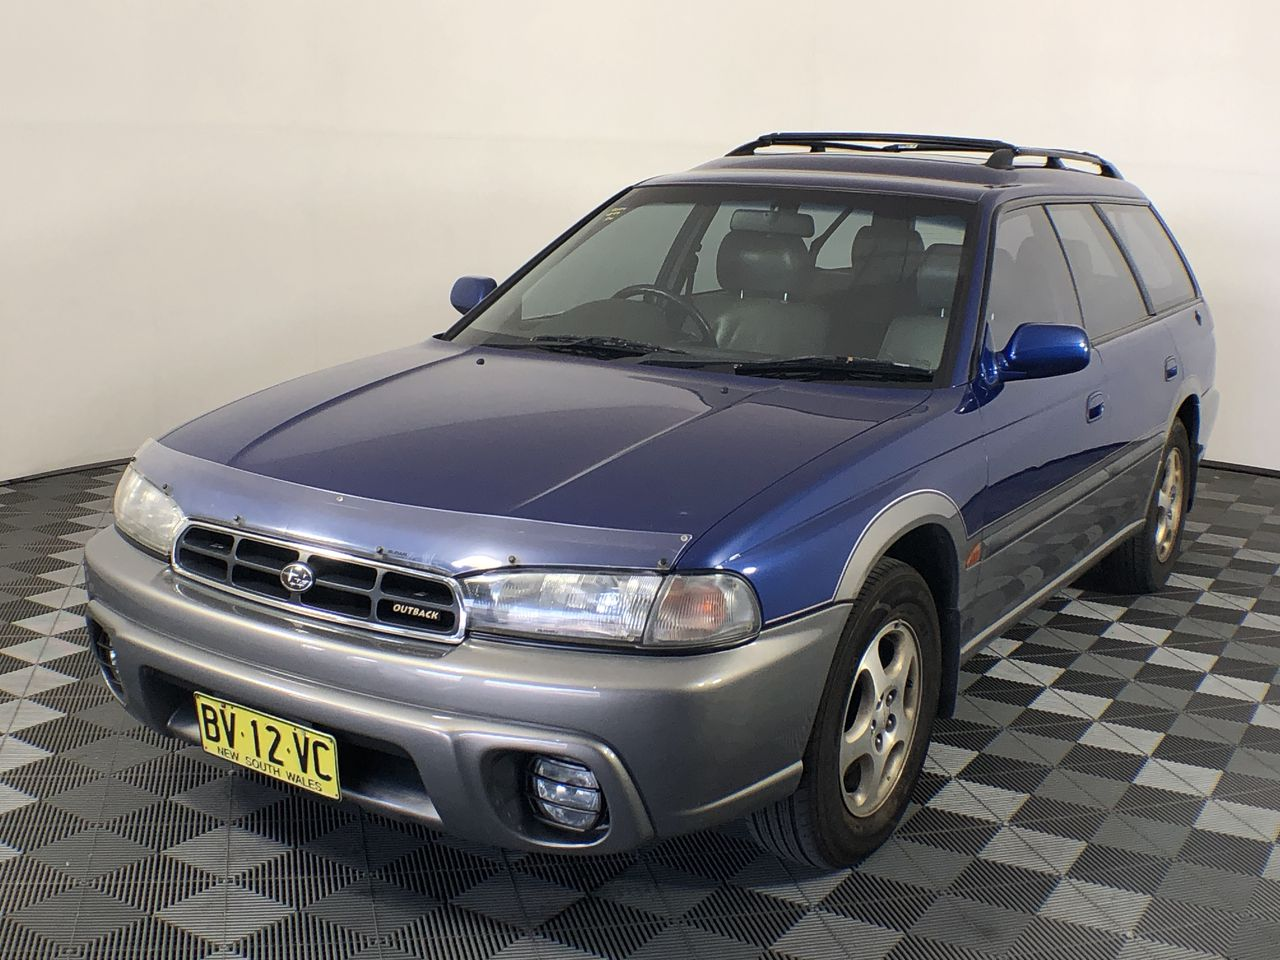 1997 Subaru Outback B2A Automatic Wagon